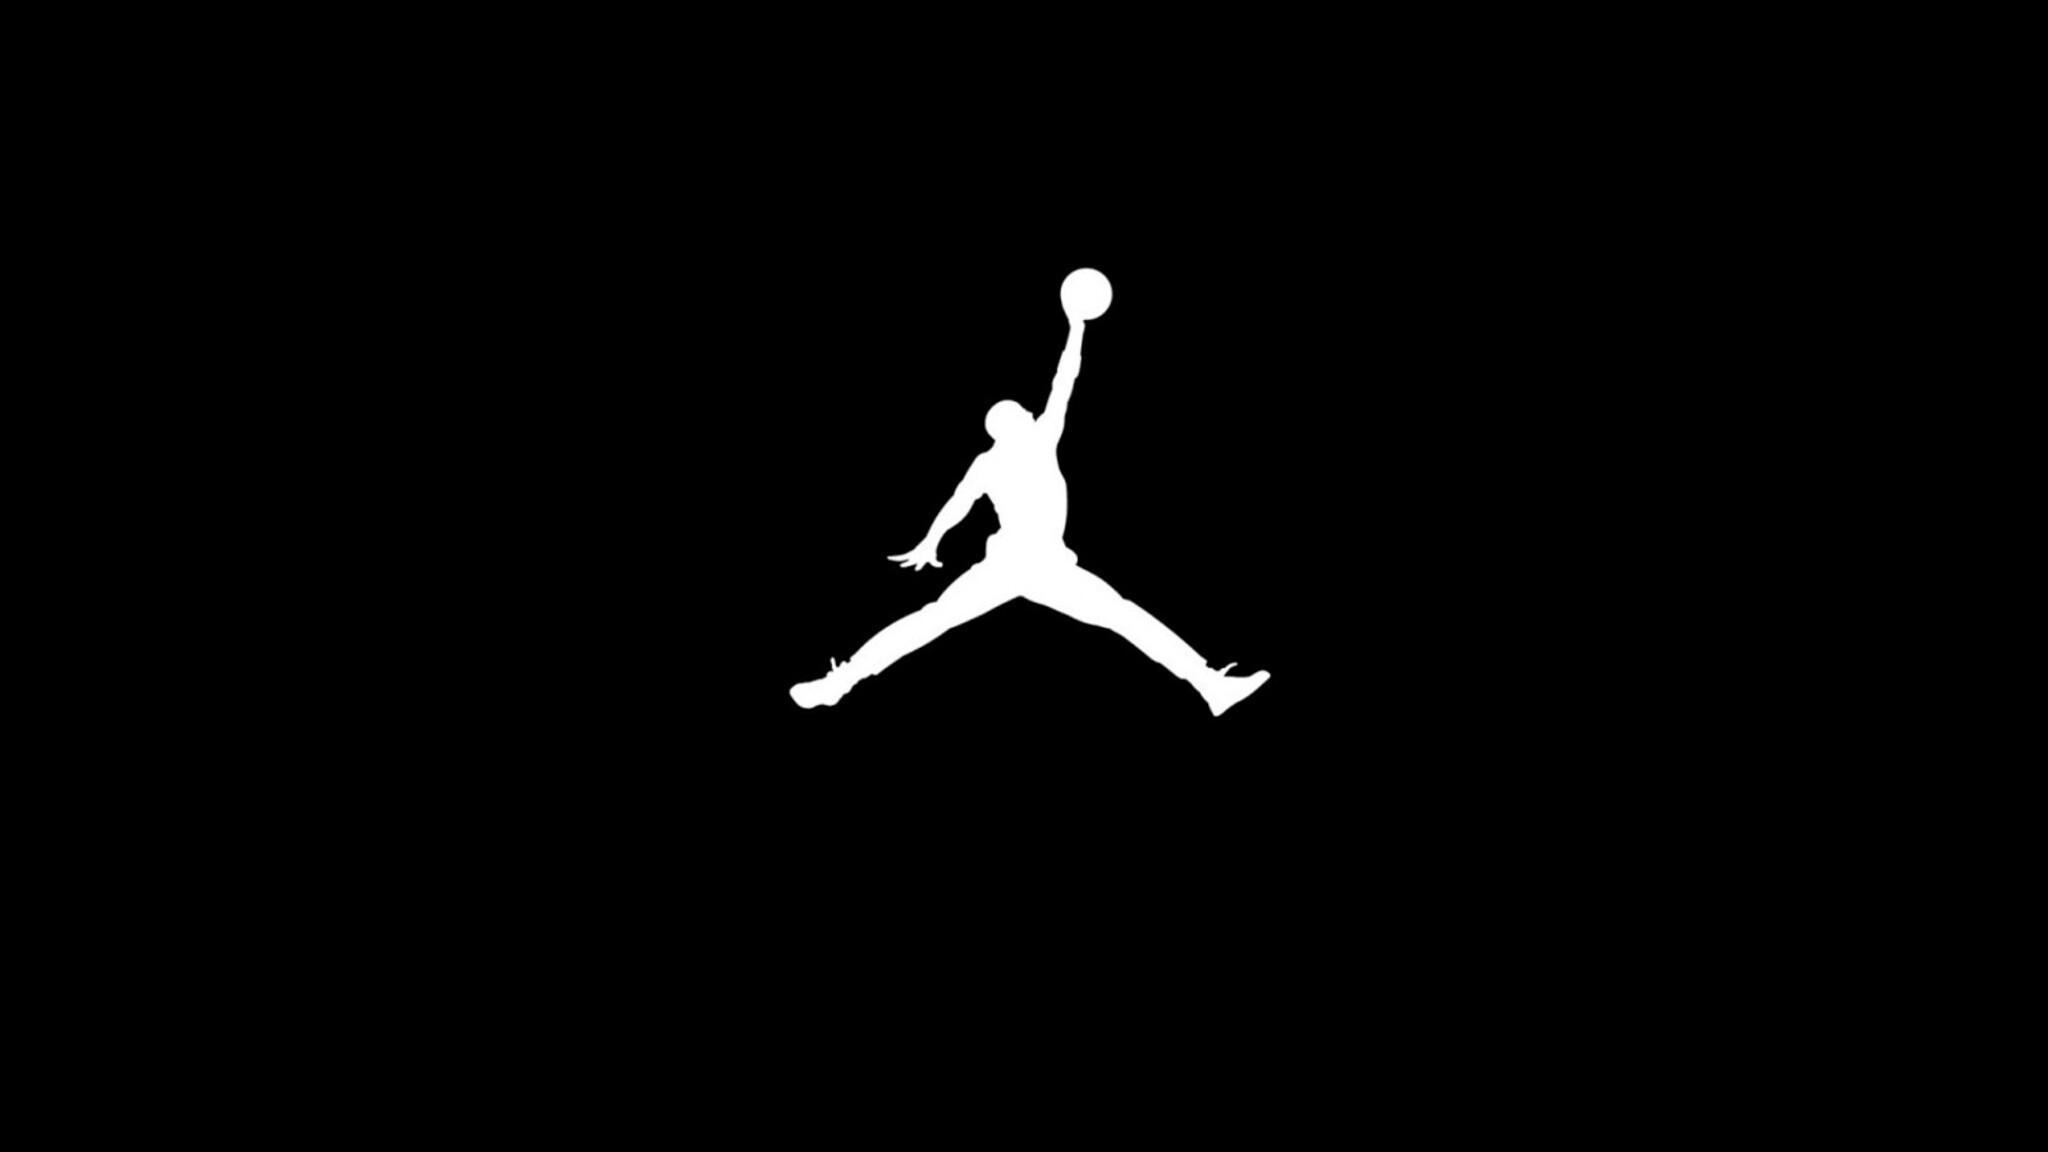 2048x1152 michael jordan 2048x1152 resolution hd 4k - Jordan jumpman logo wallpaper ...